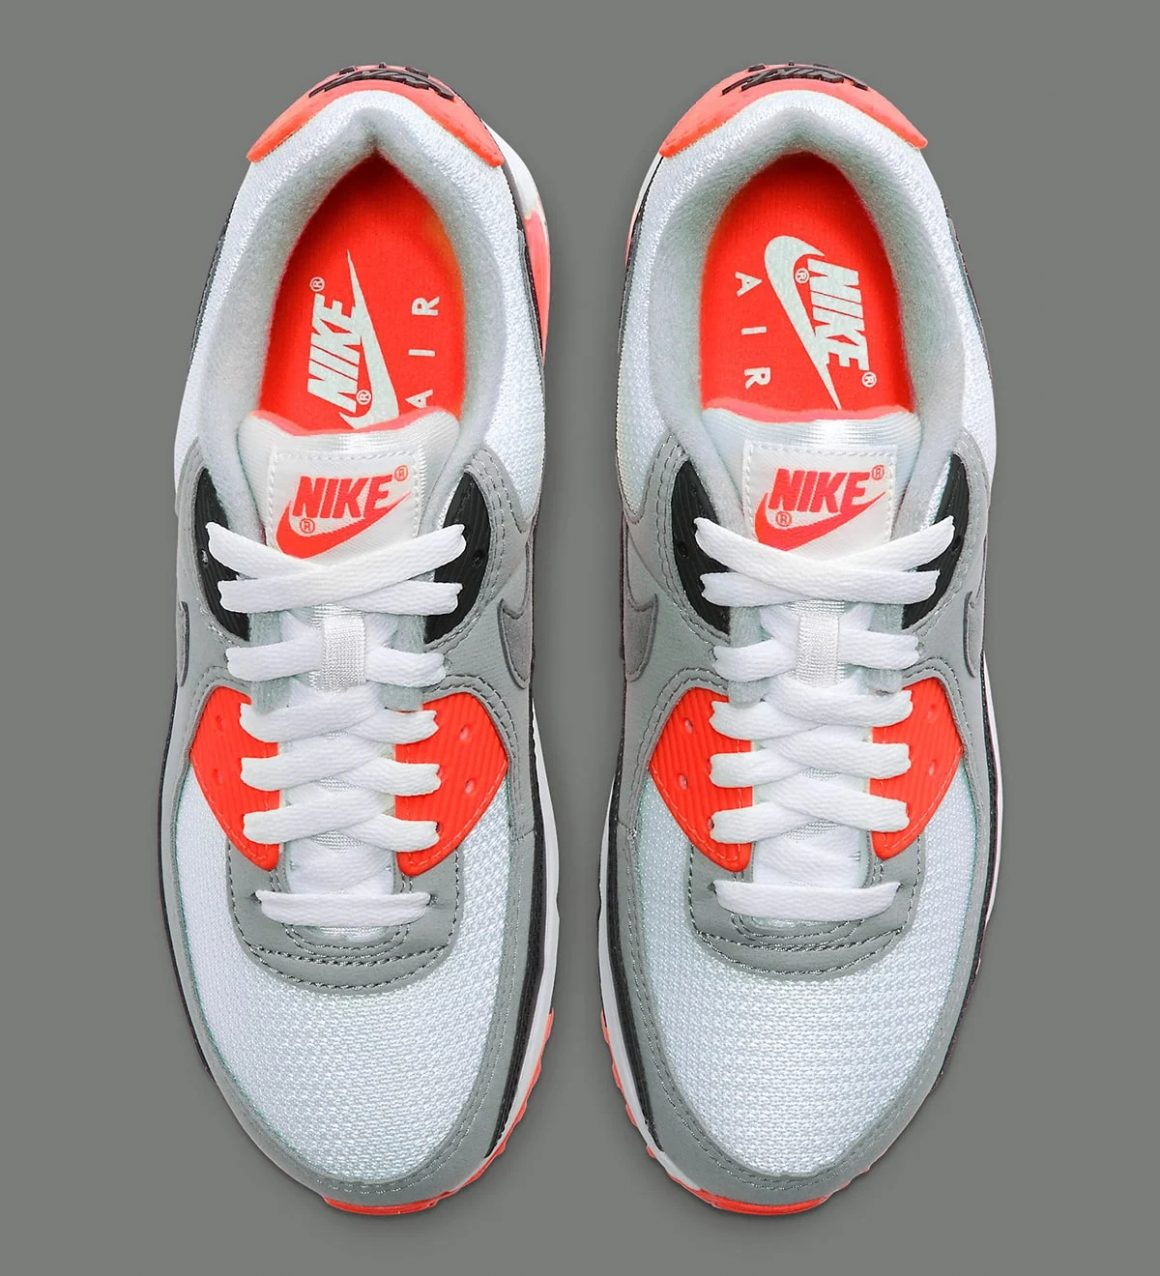 Nike Air Max 90 OG ''Infrared'' 2020 - CT1685-100